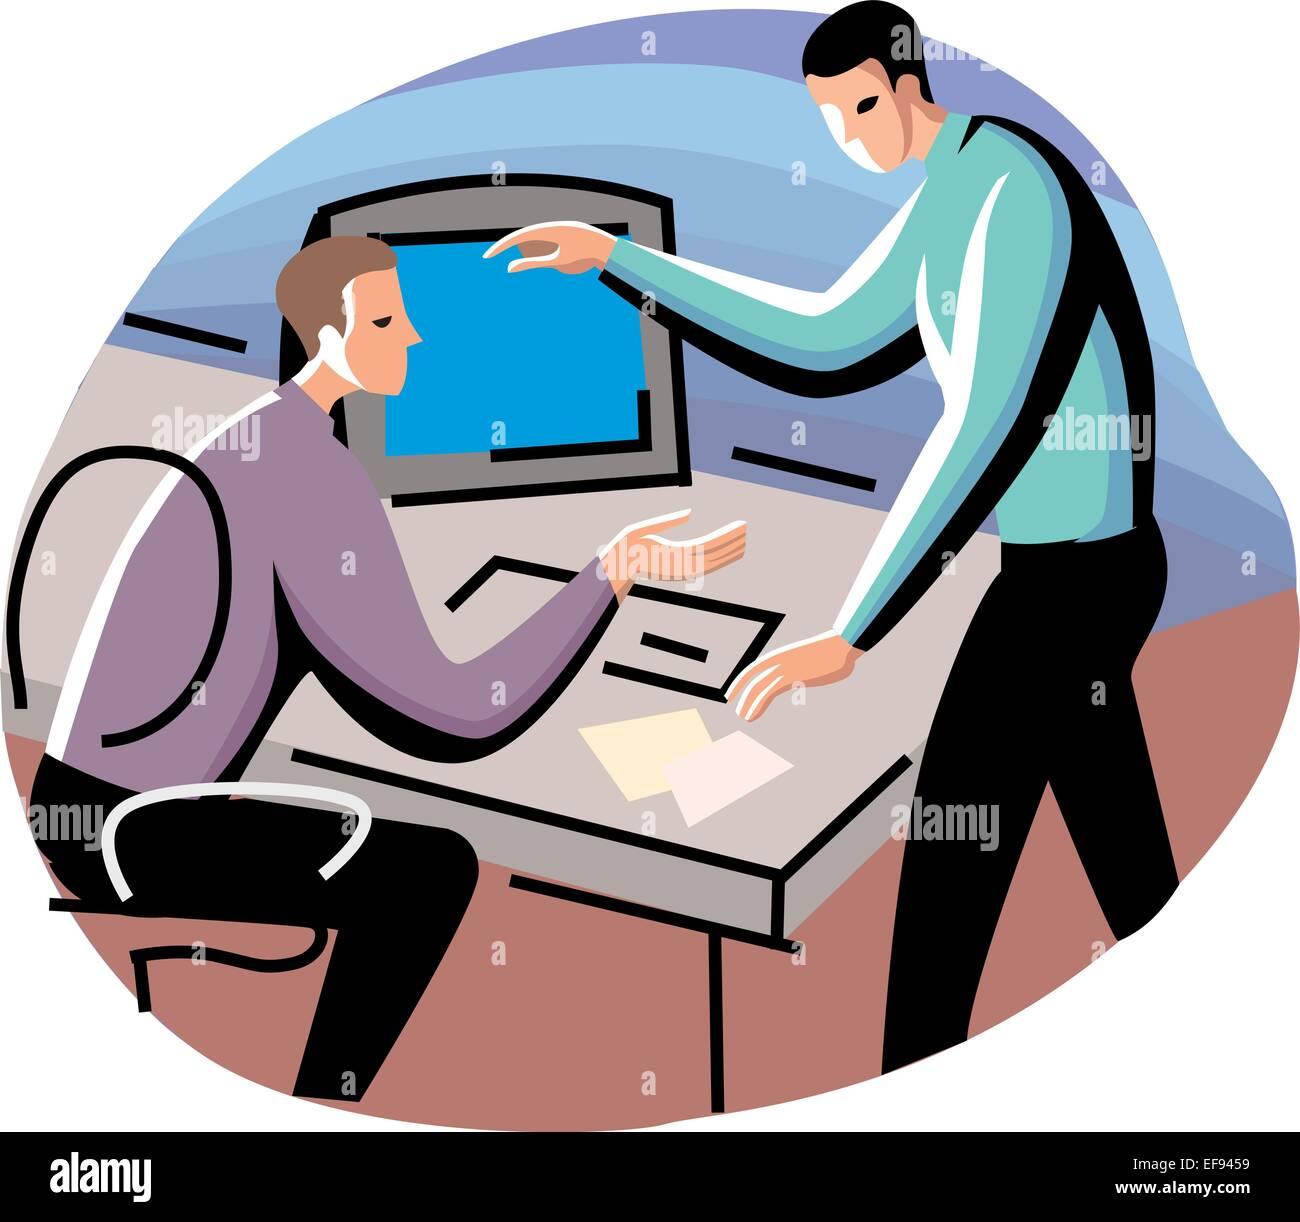 Two Men in Business Meeting - Stock Vector